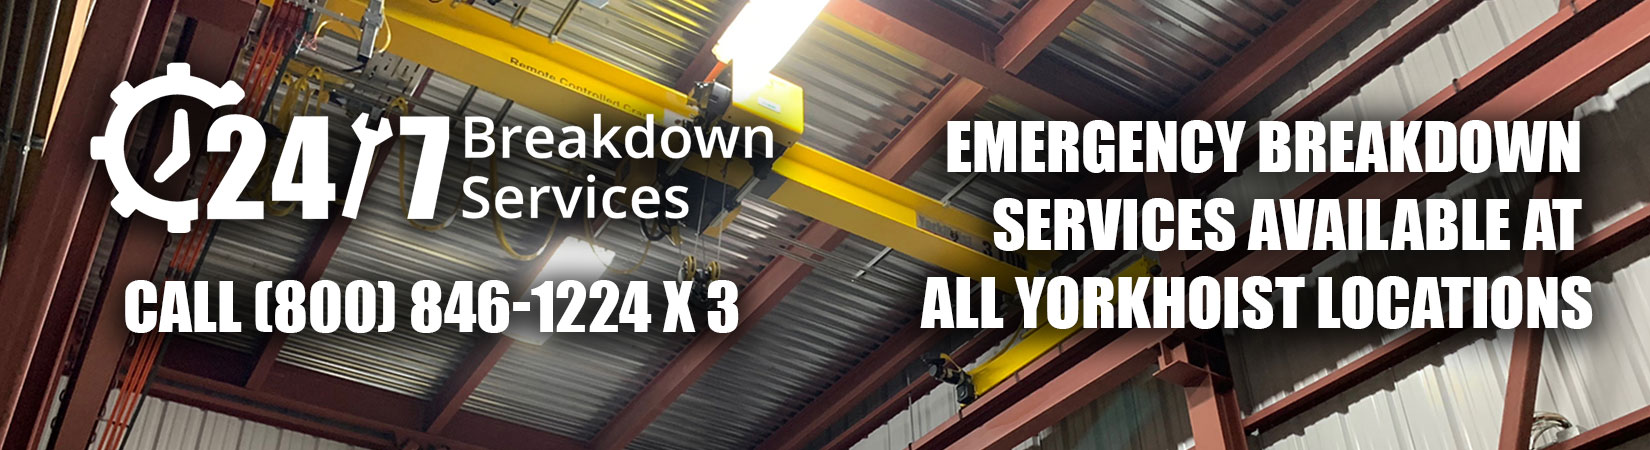 24/7 Breakdown Services Ad